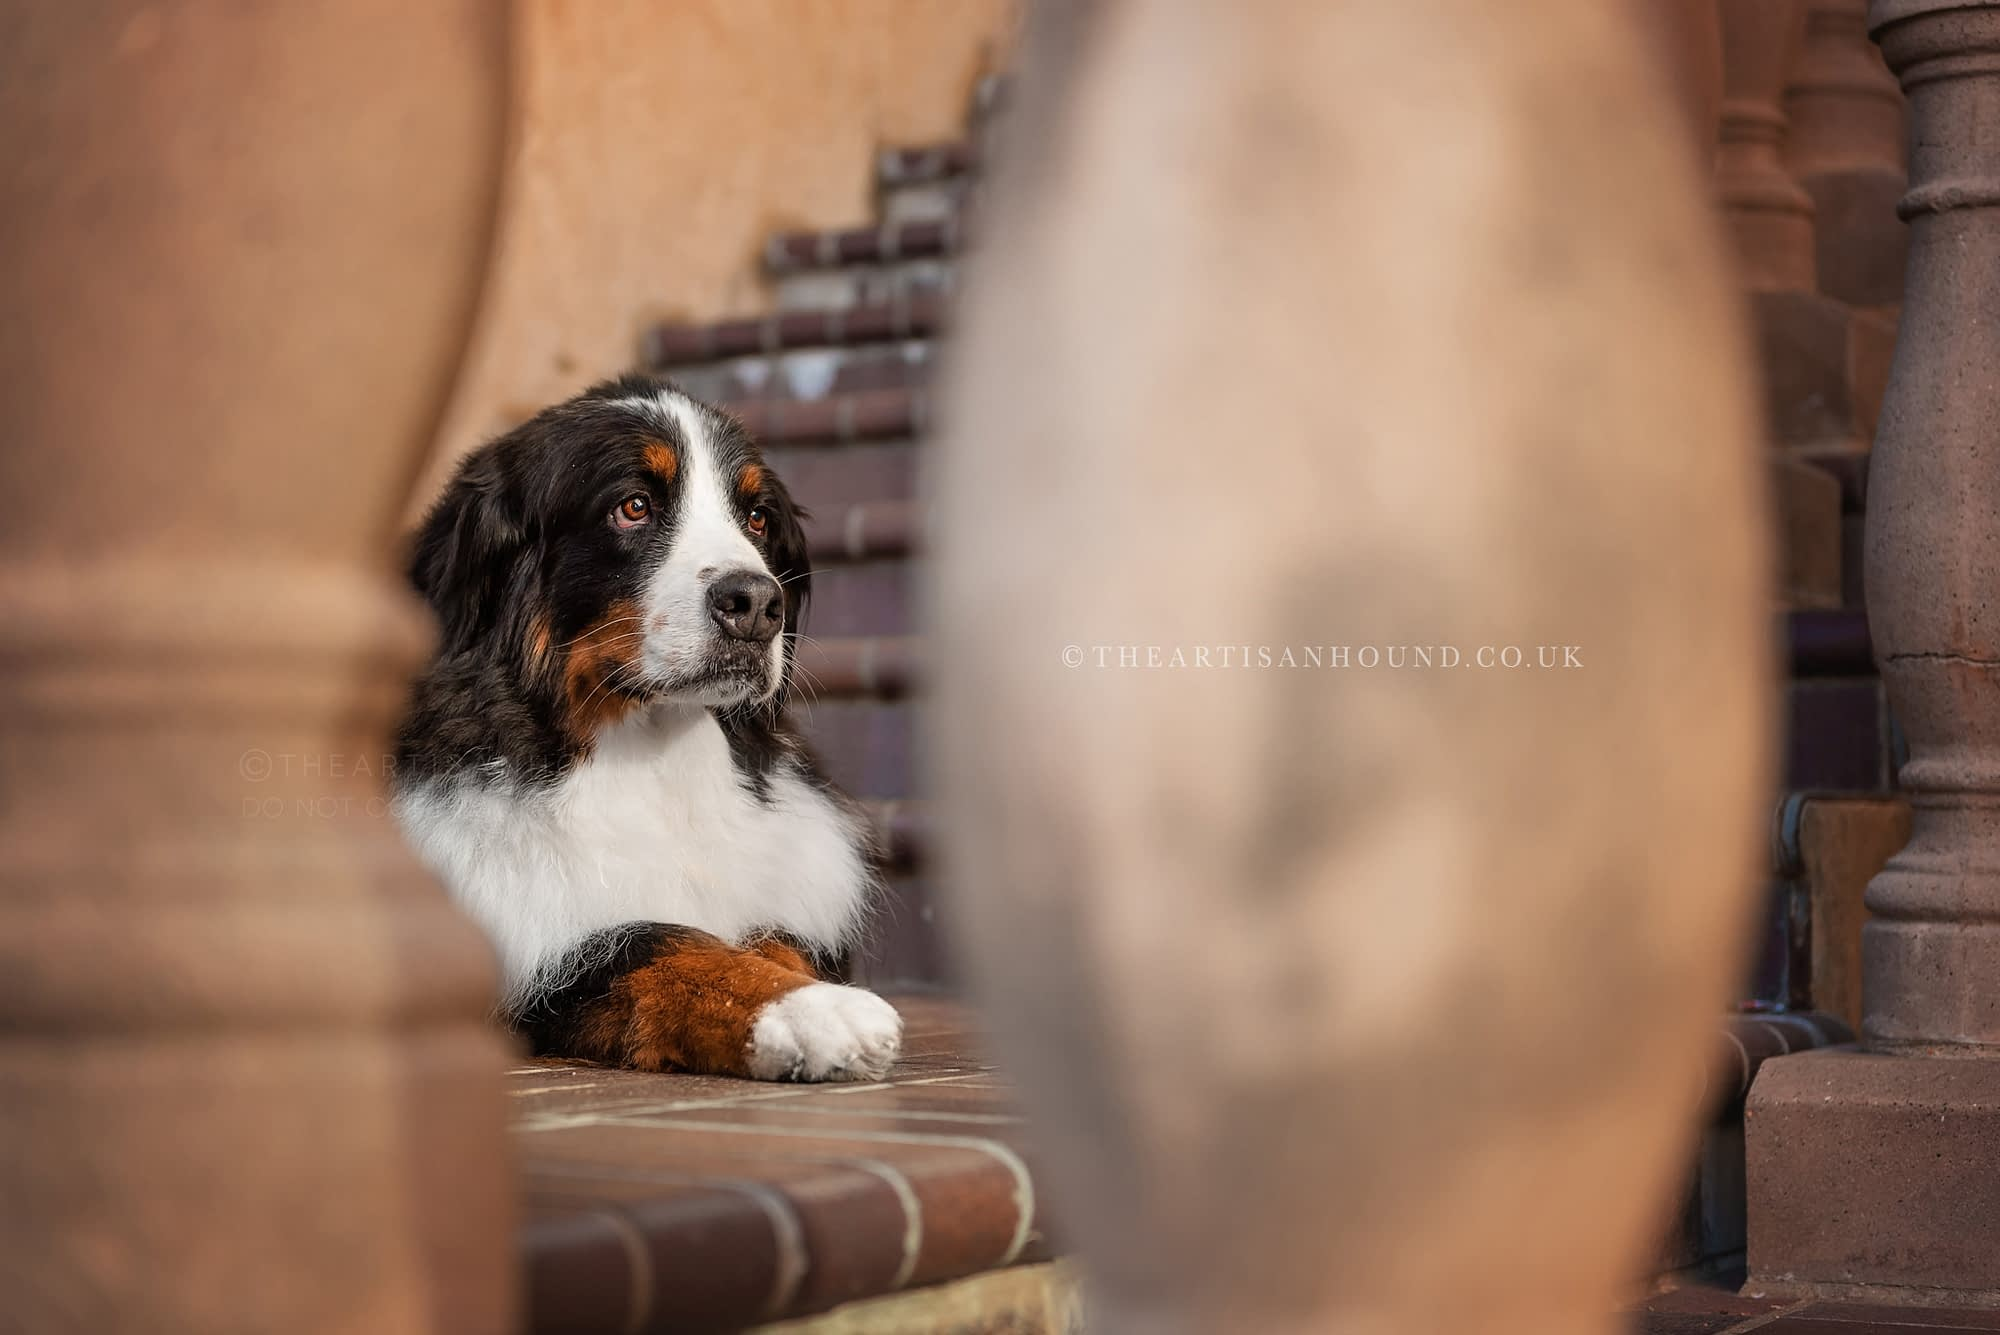 Bernese mountain dog sitting on steps